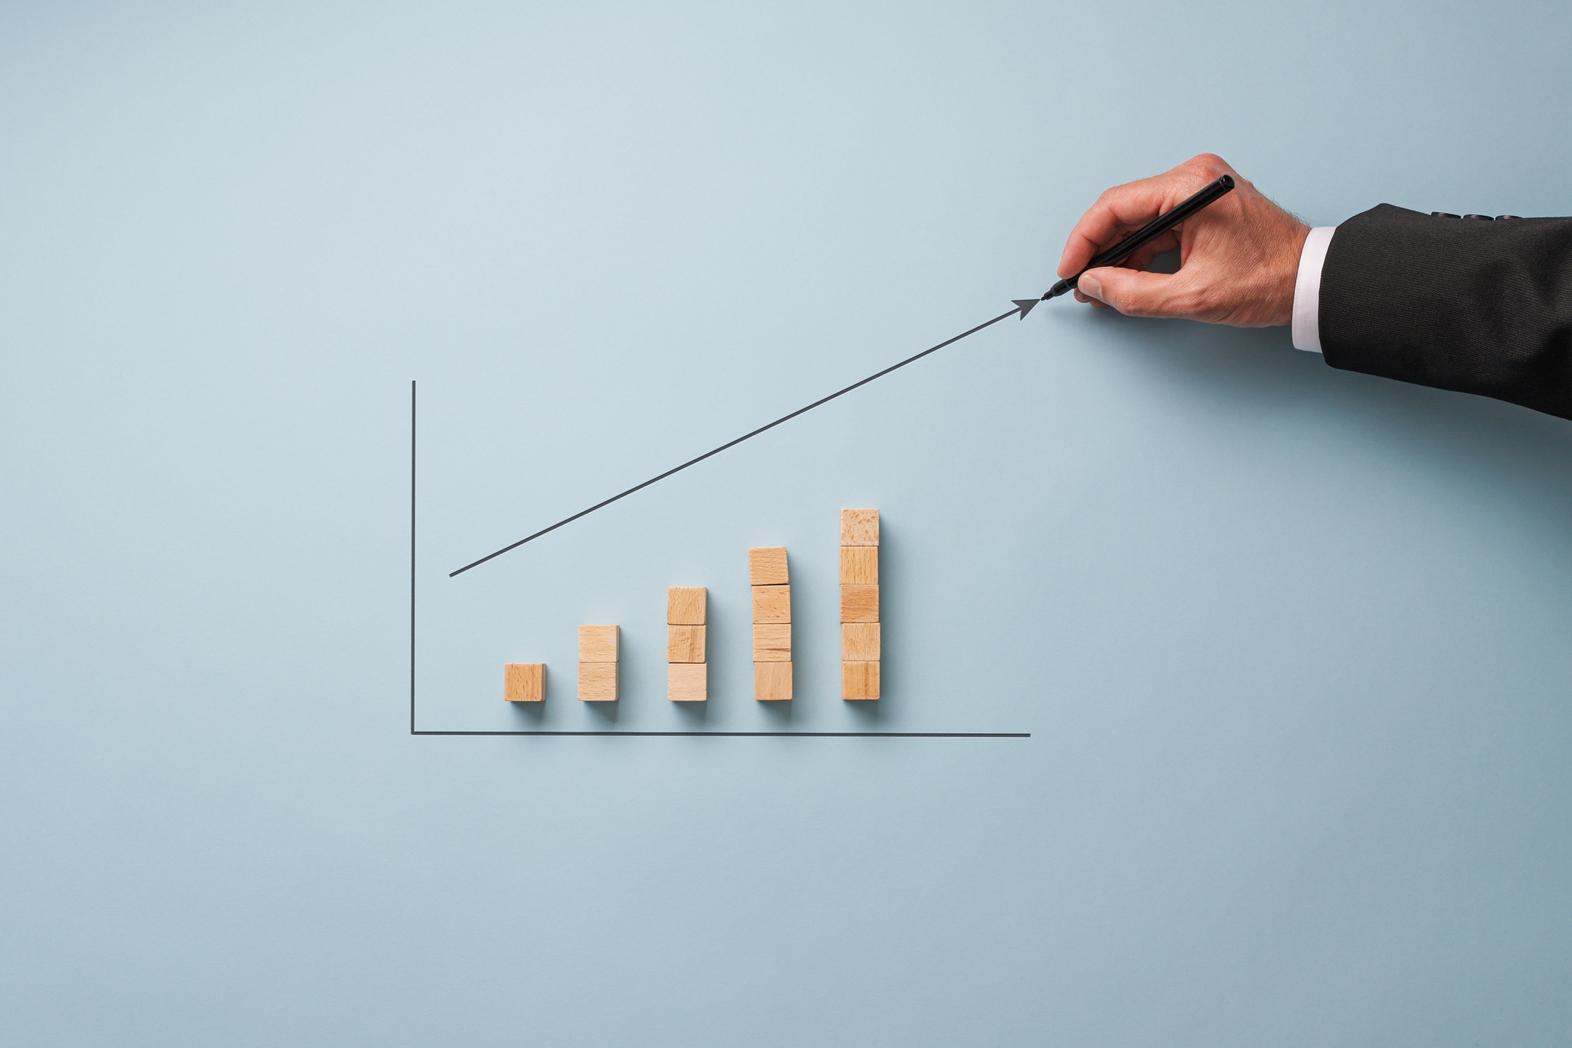 Brand-Hubb-Growth-1.jpg